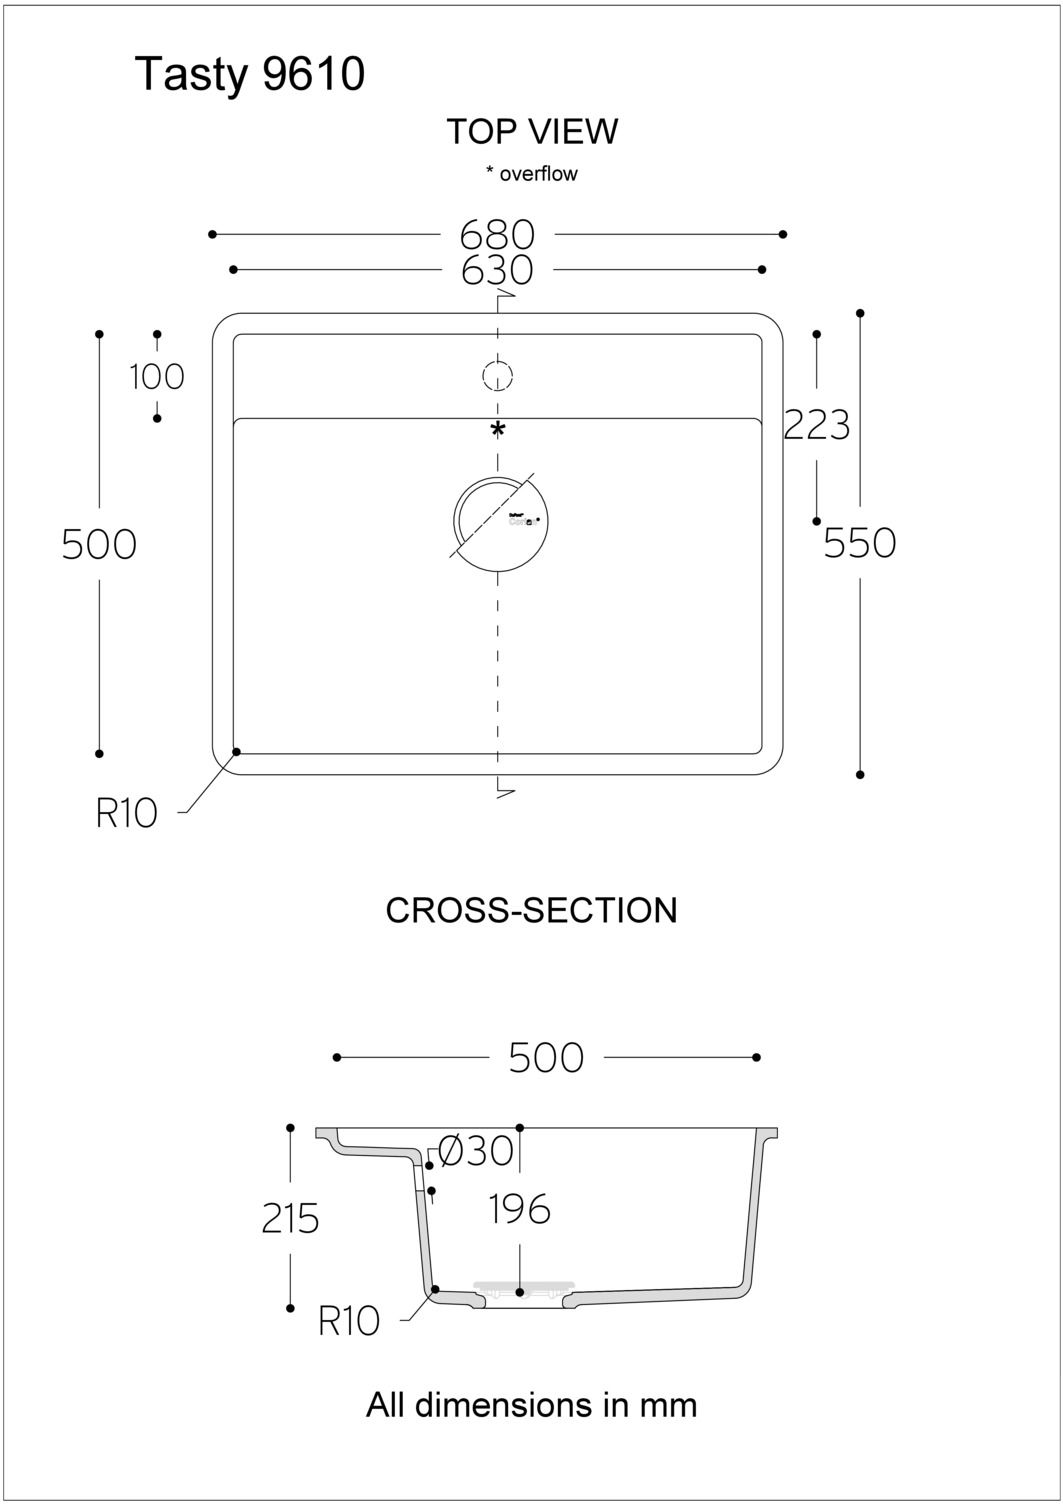 DUPONT_CORIAN_TASTY9610_2D_PDF[0]